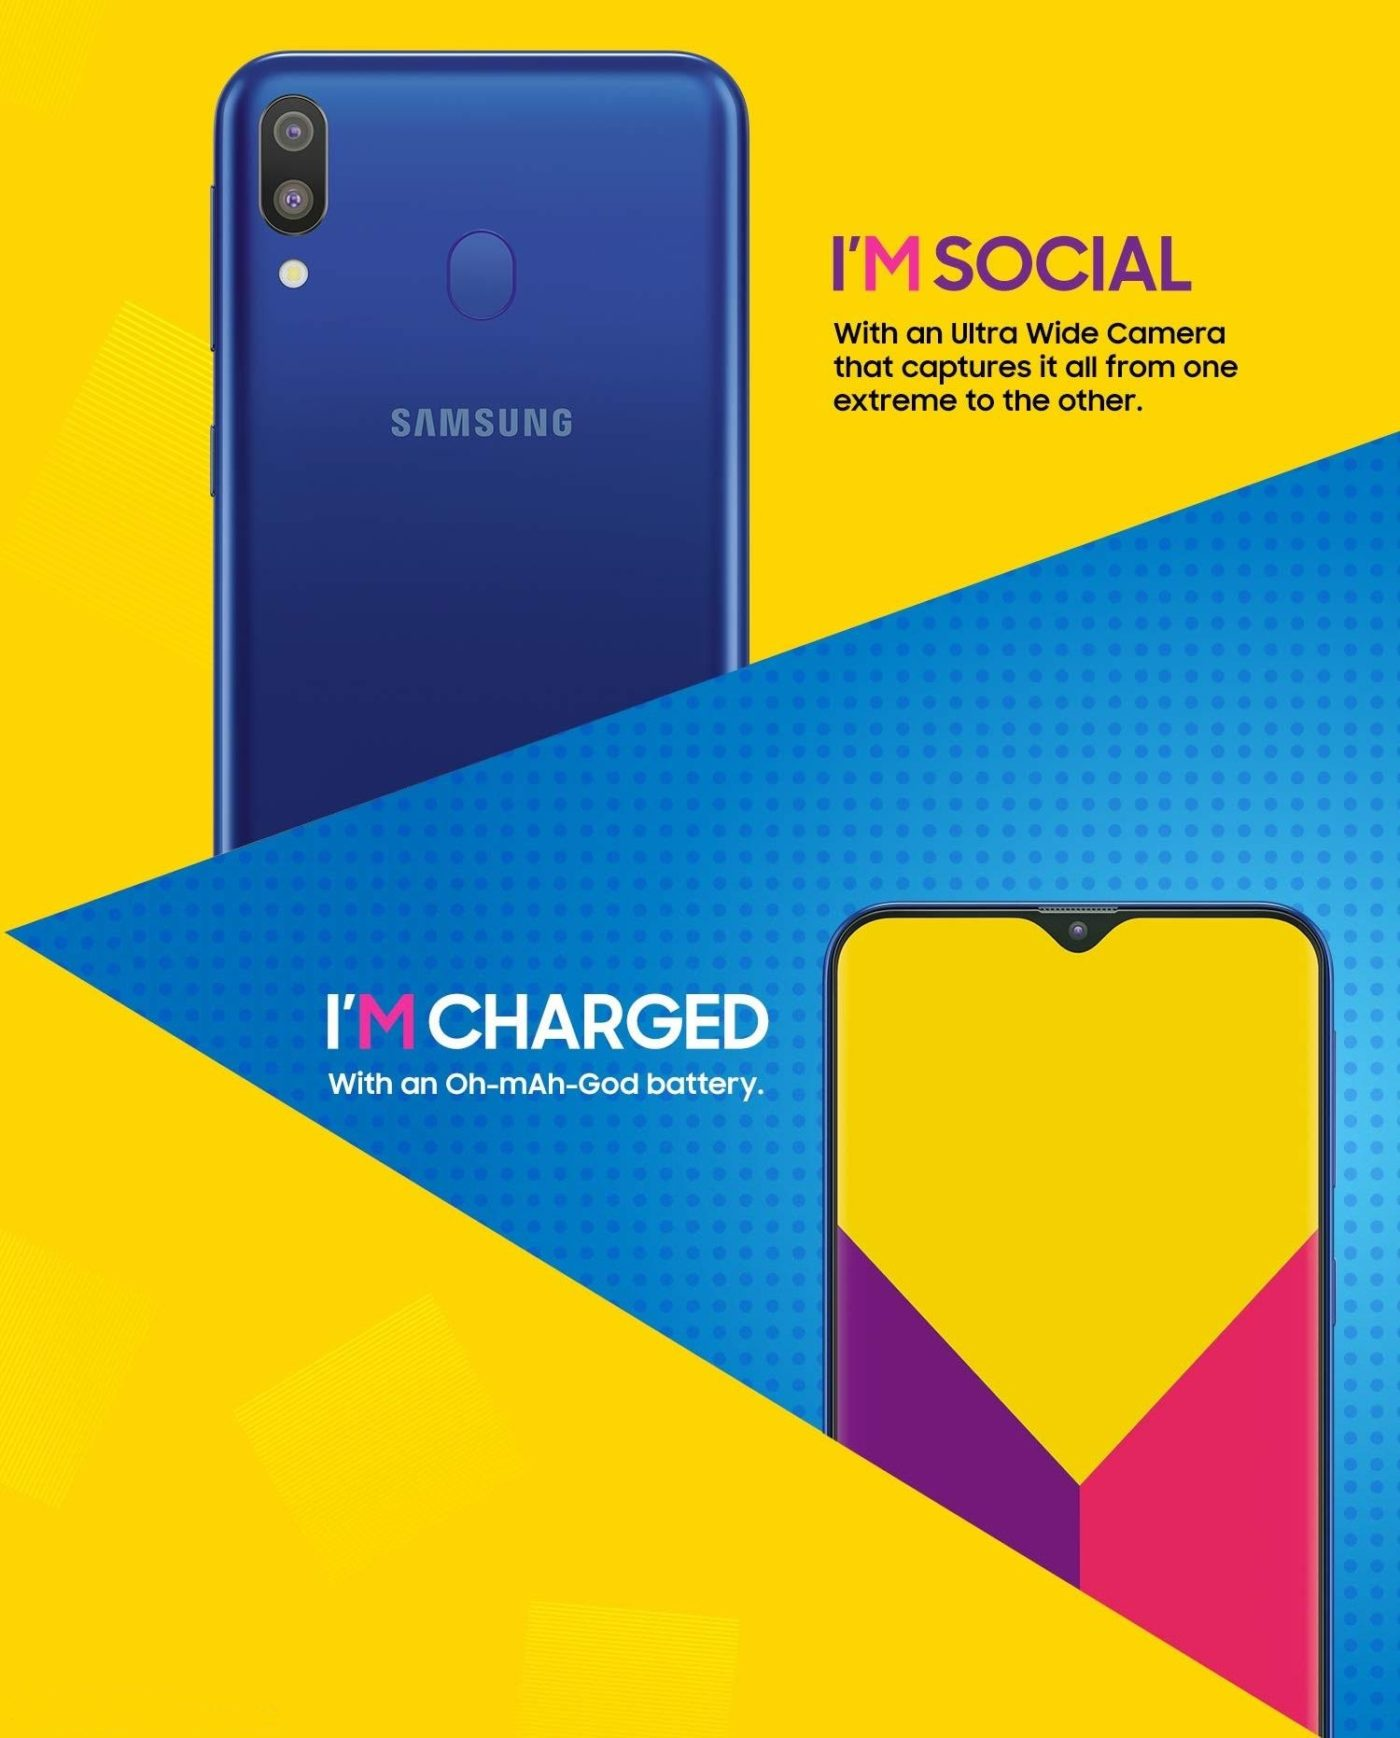 Samsung Galaxy M20 Leaked - Hosts A Massive 5000 mAh Battery, A Teardrop Notch & More 3